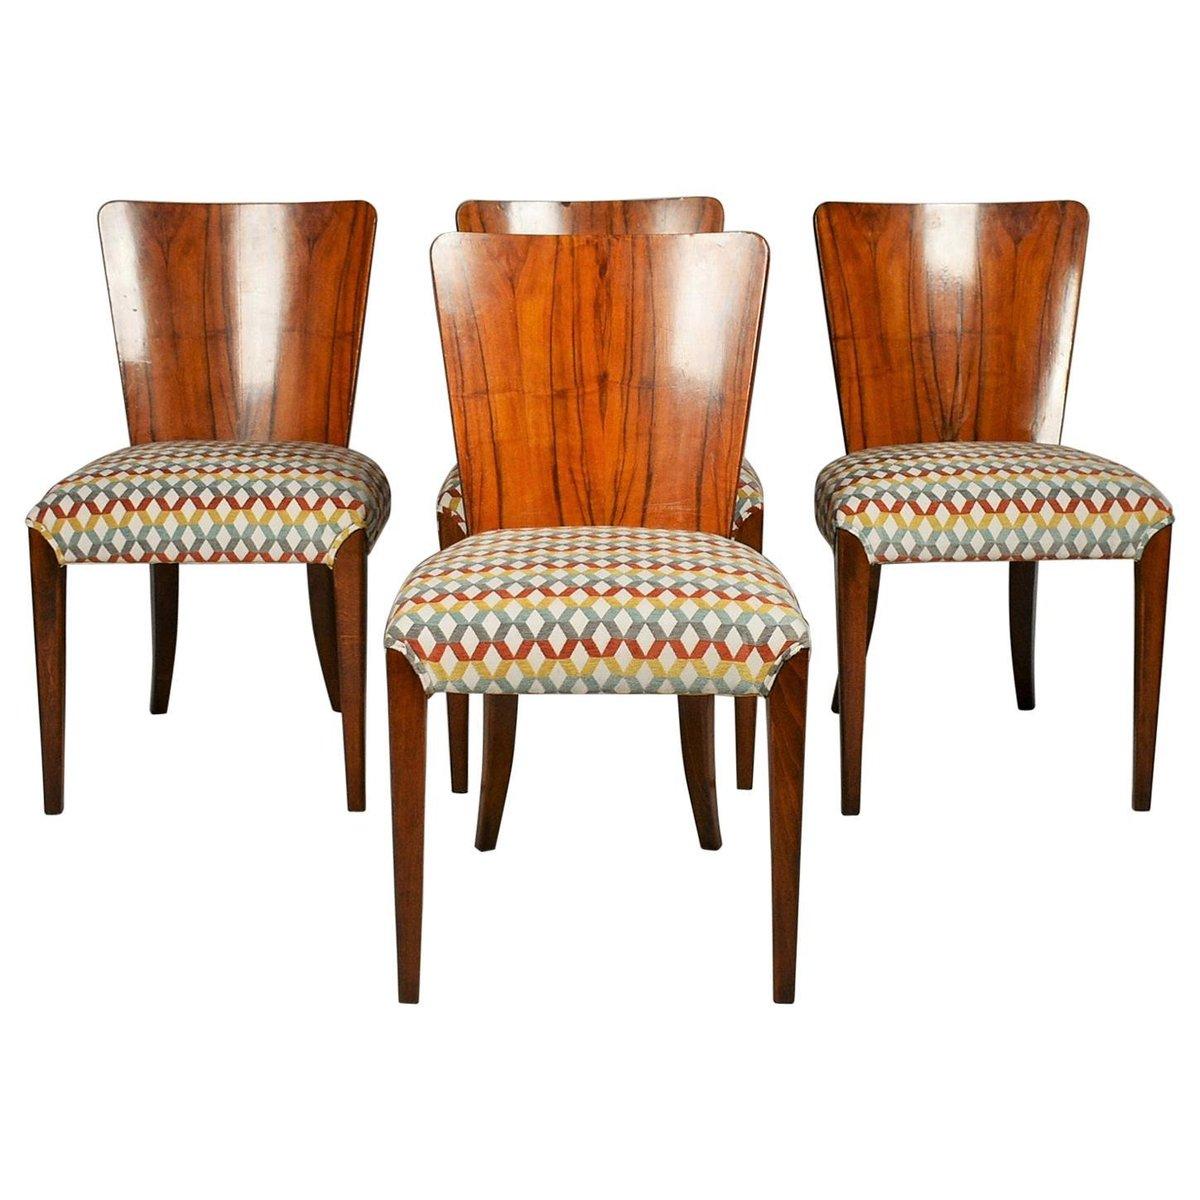 Halabala dining chairs